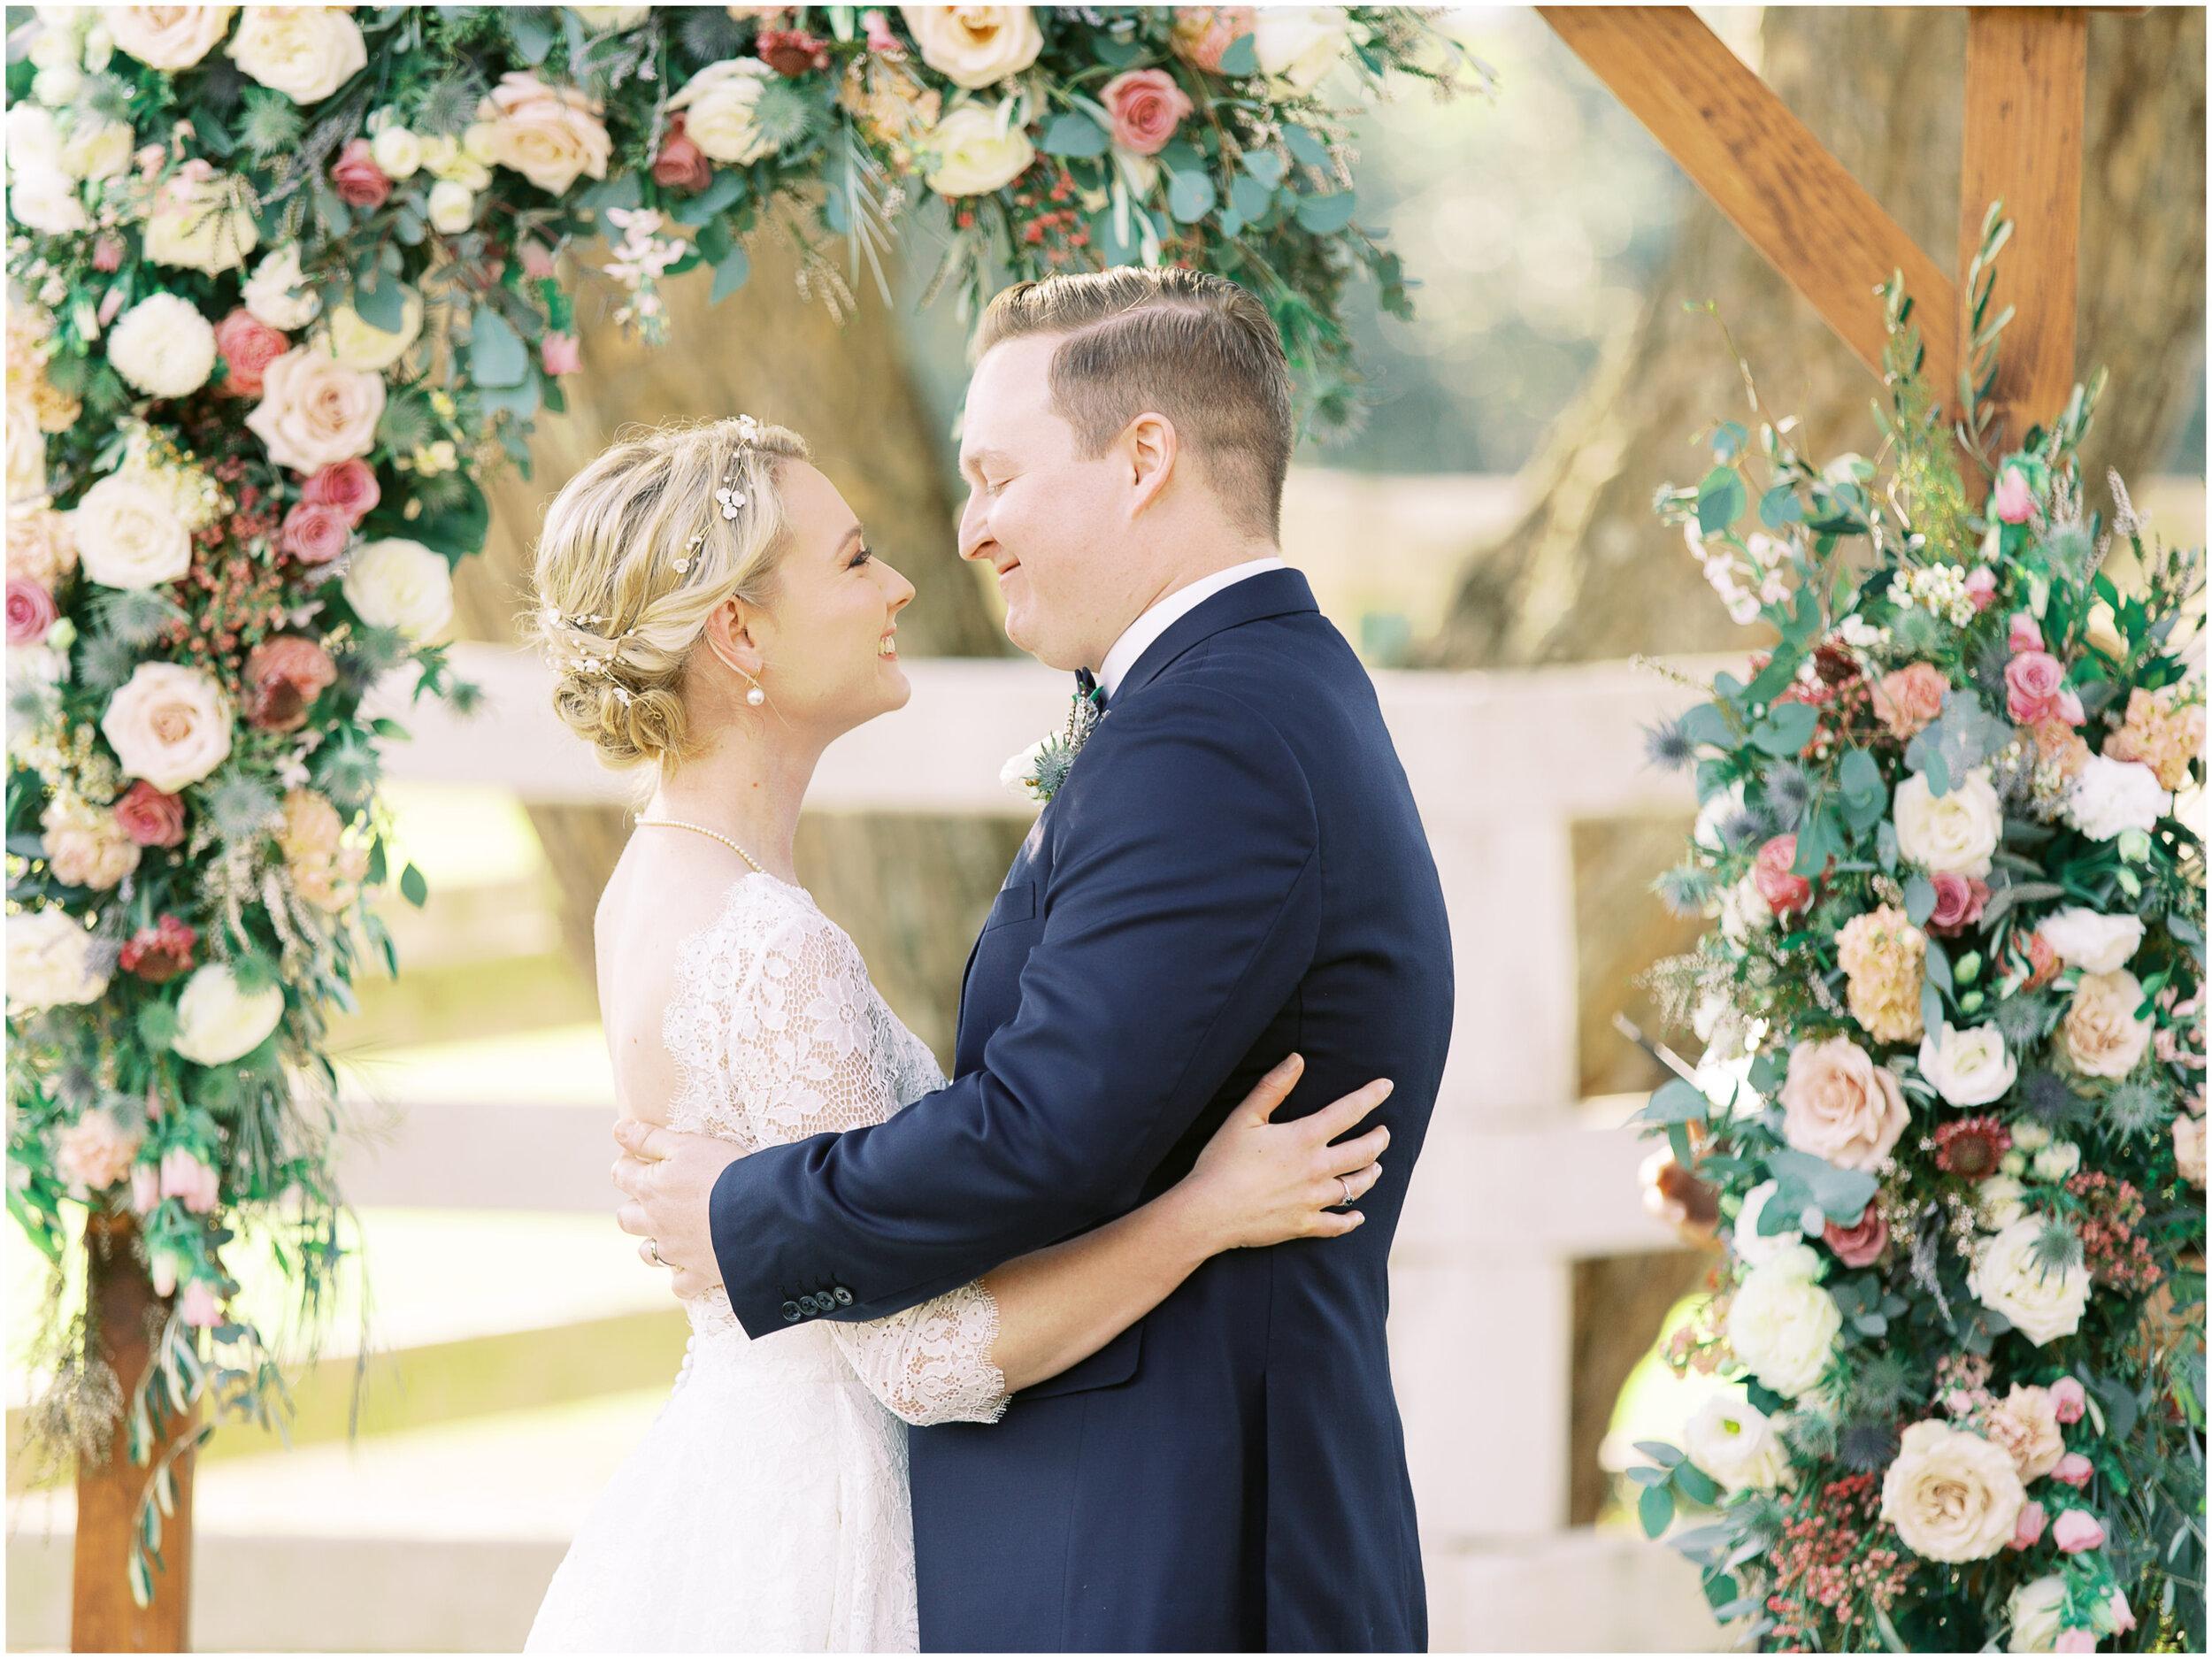 brisbane-film-wedding-photographer-lauren-olivia-luxury-wedding-australia-01-09.jpg